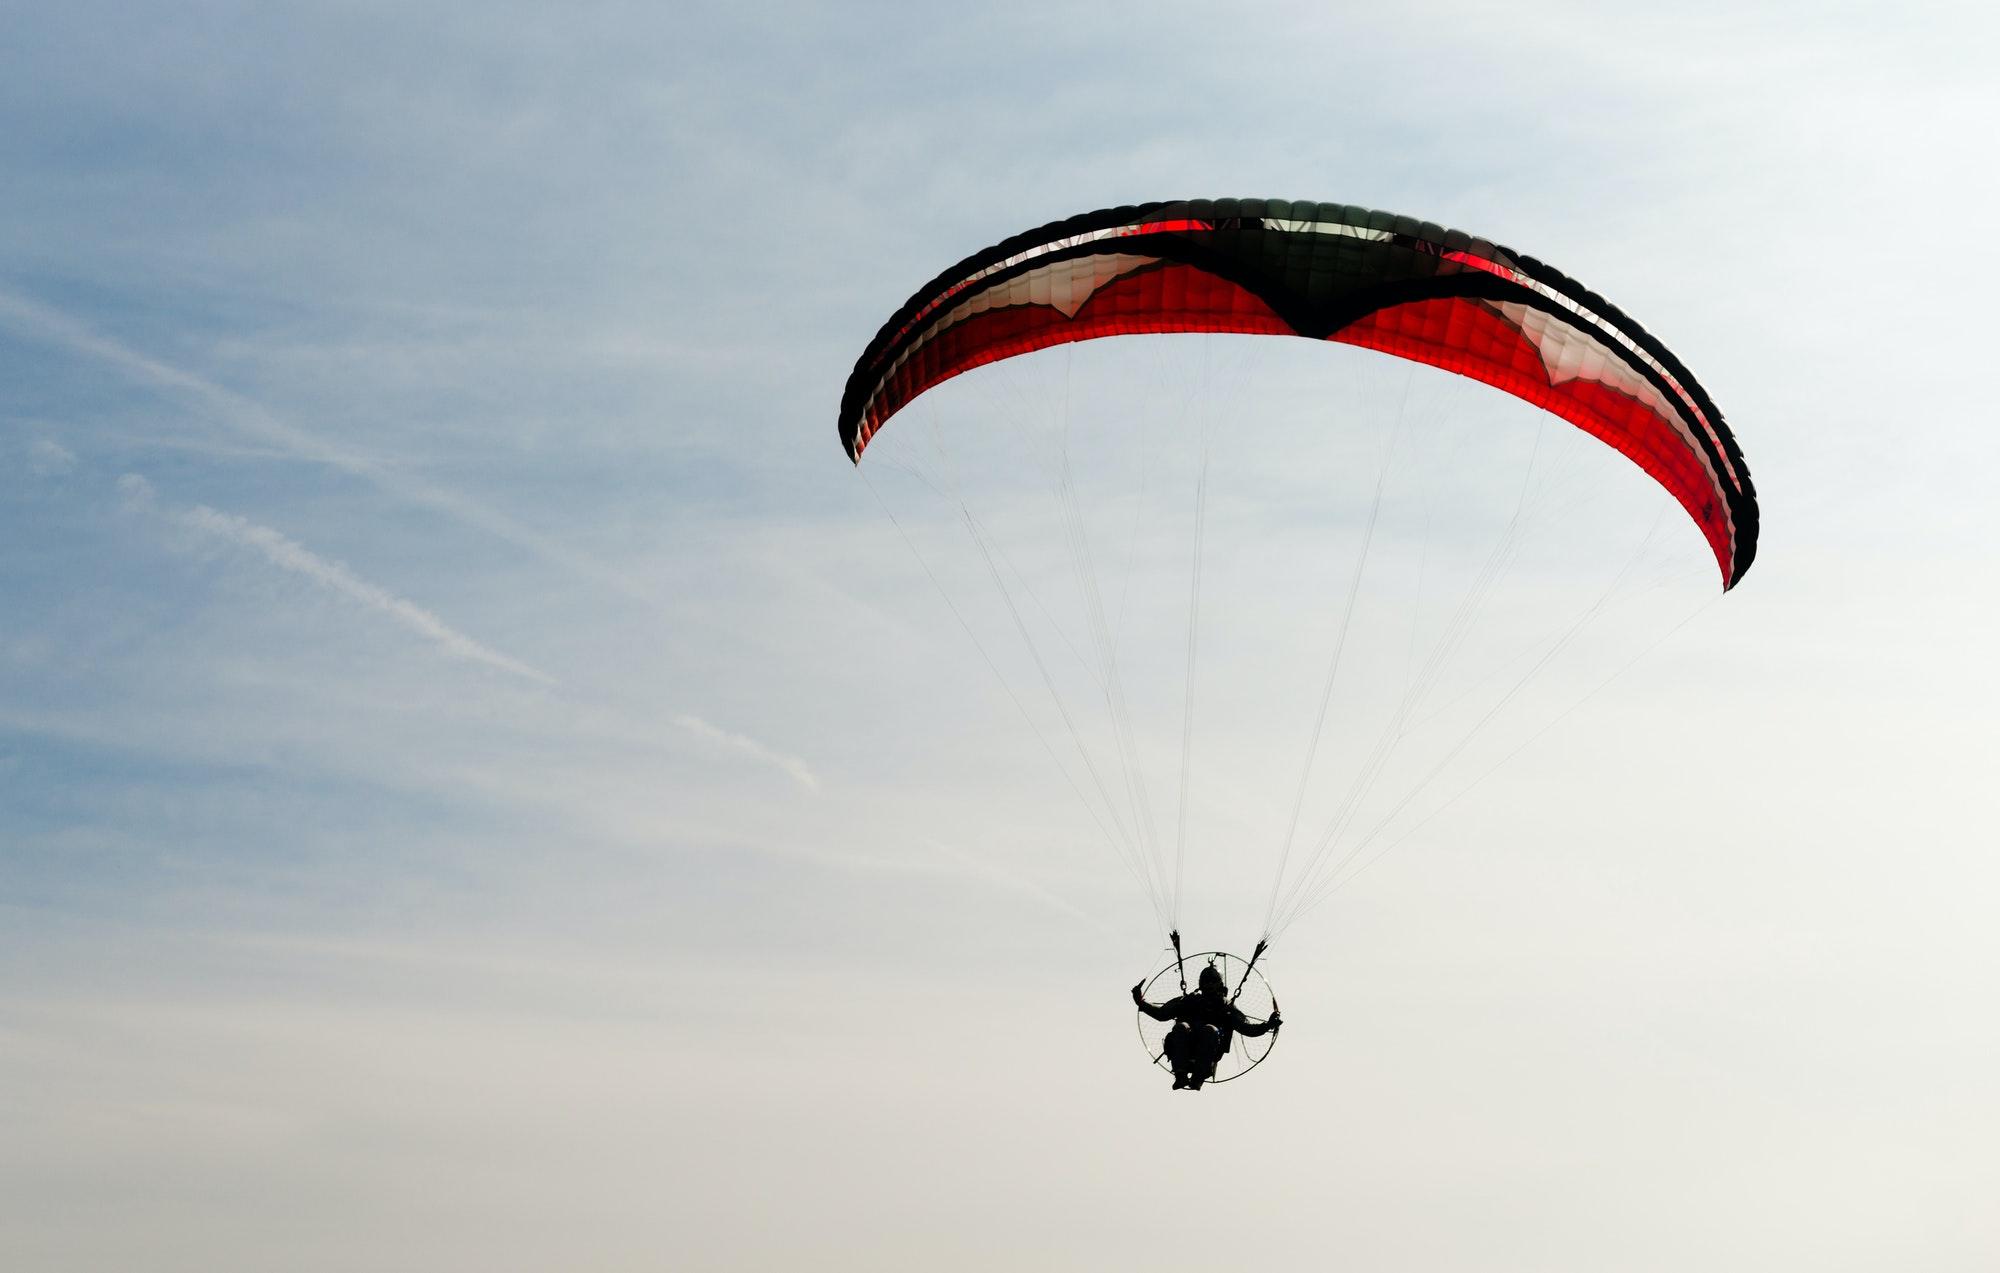 One Man Rides Flies Ultralight Flying Through Blue Sky